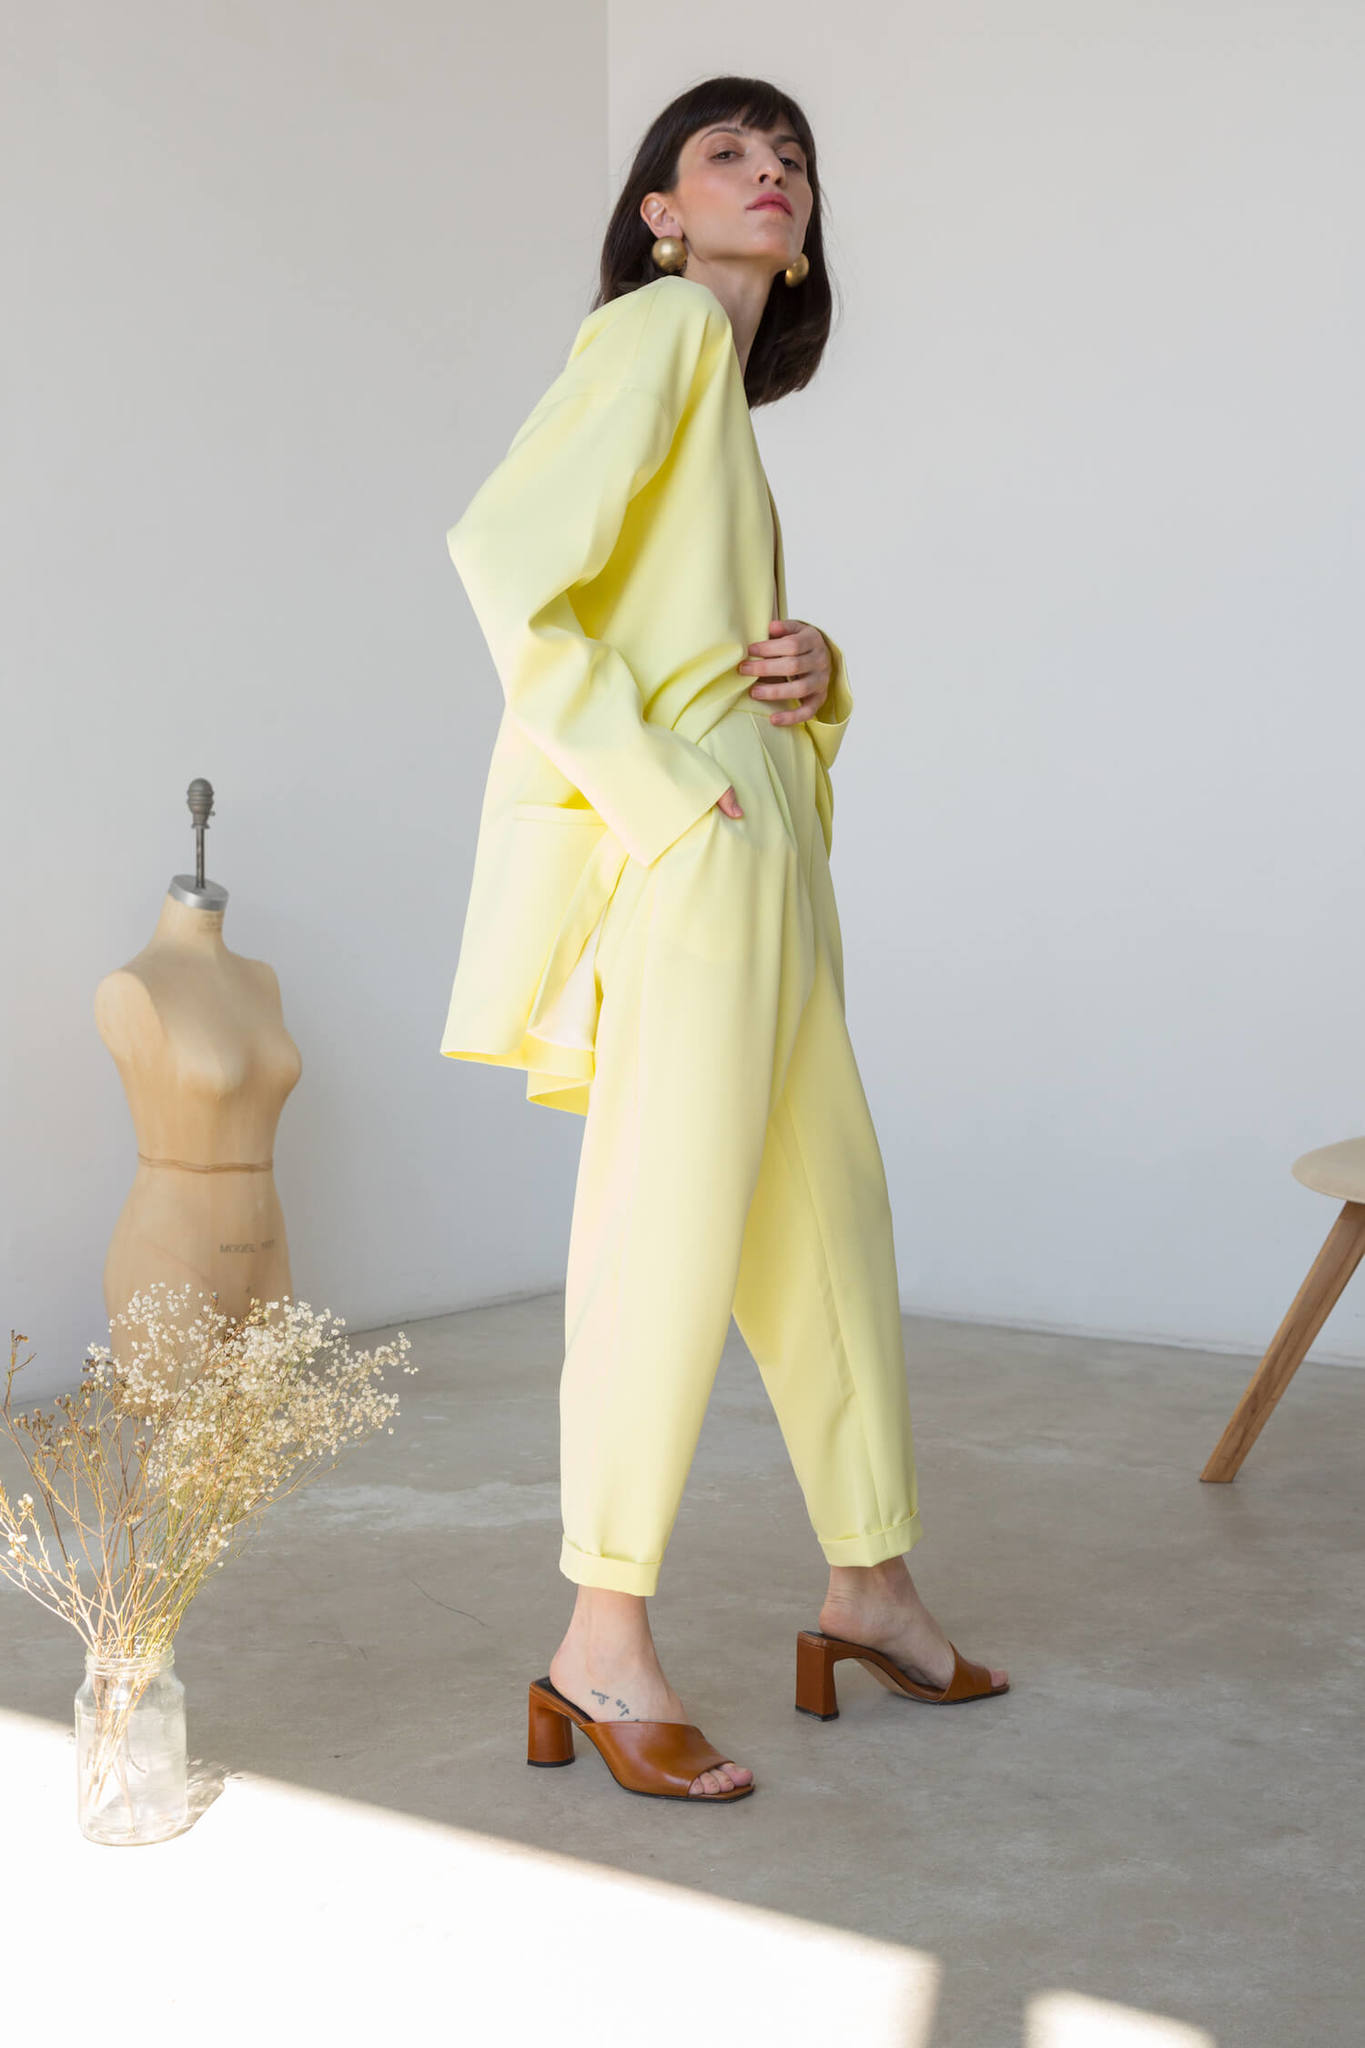 Брюки-дудочки с защипами, светло-желтые